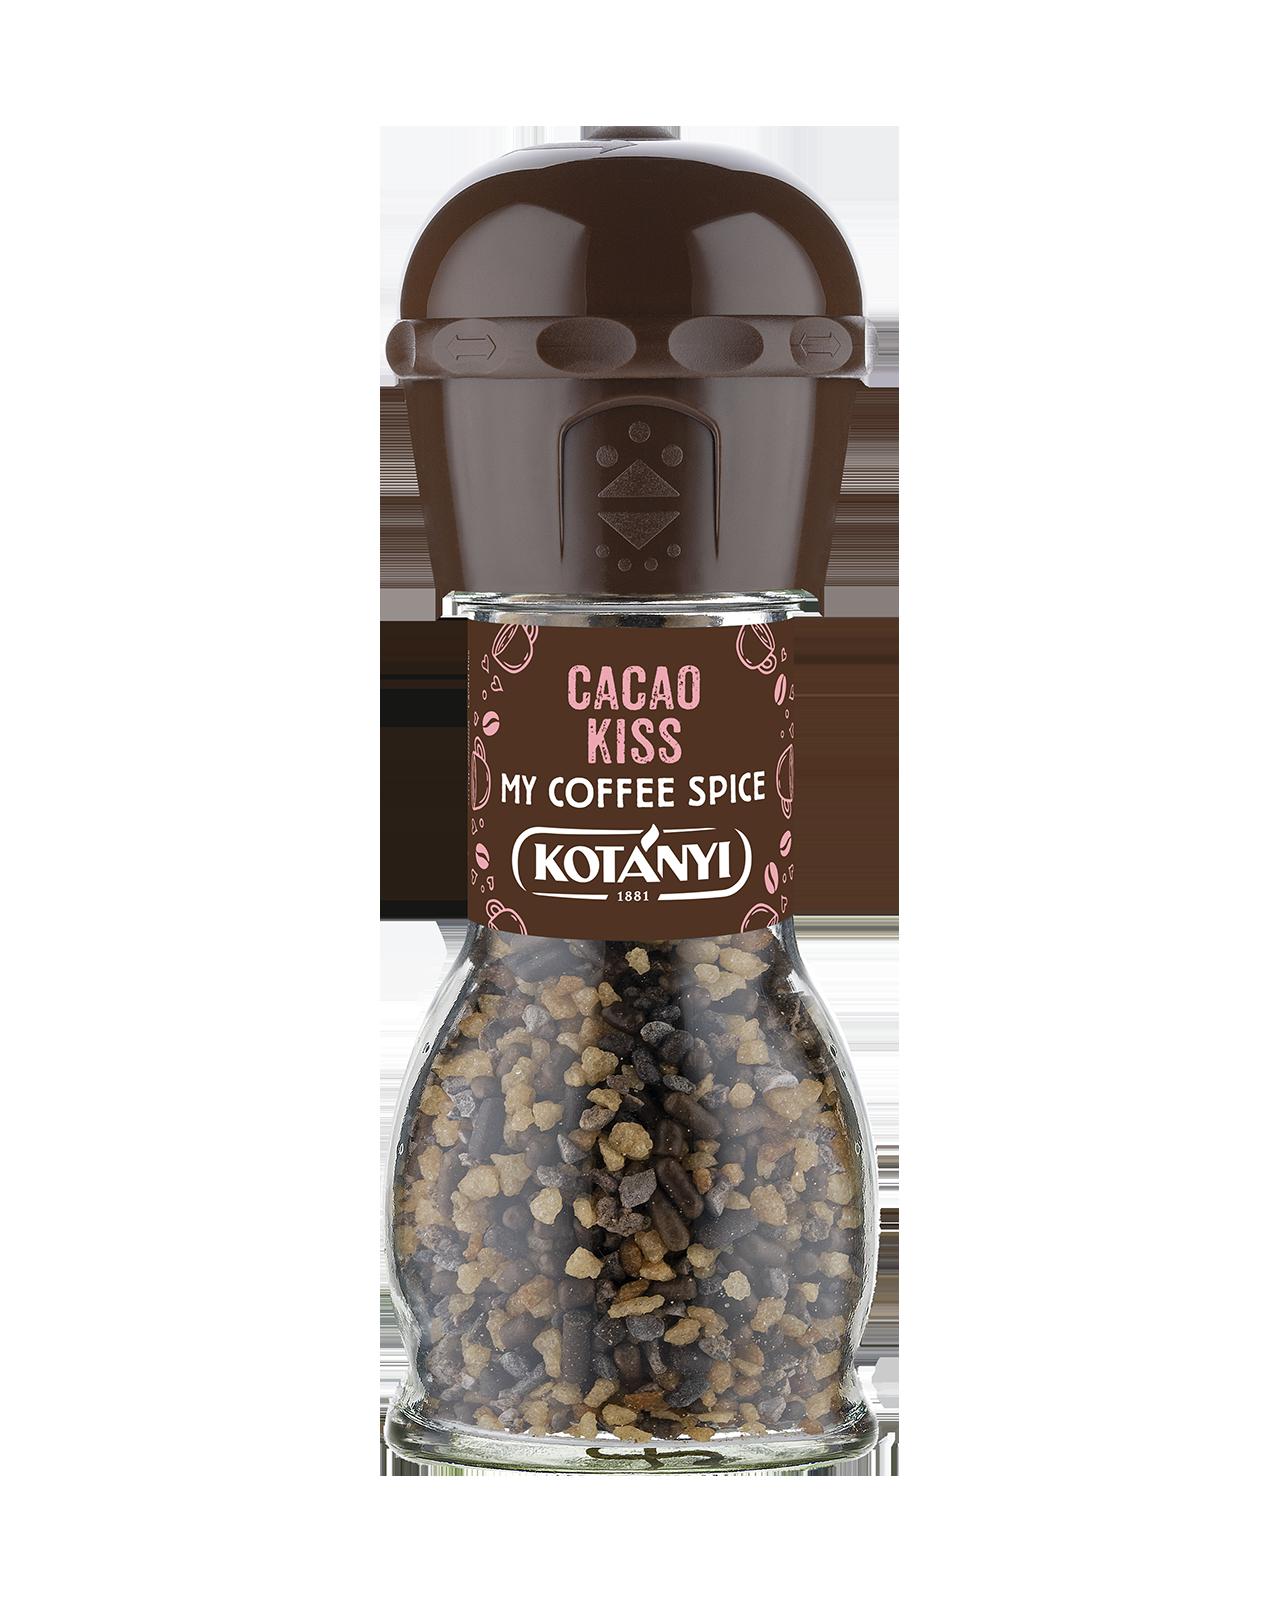 438002 Kotanyi Cacao Kiss B2c Mill Disposable